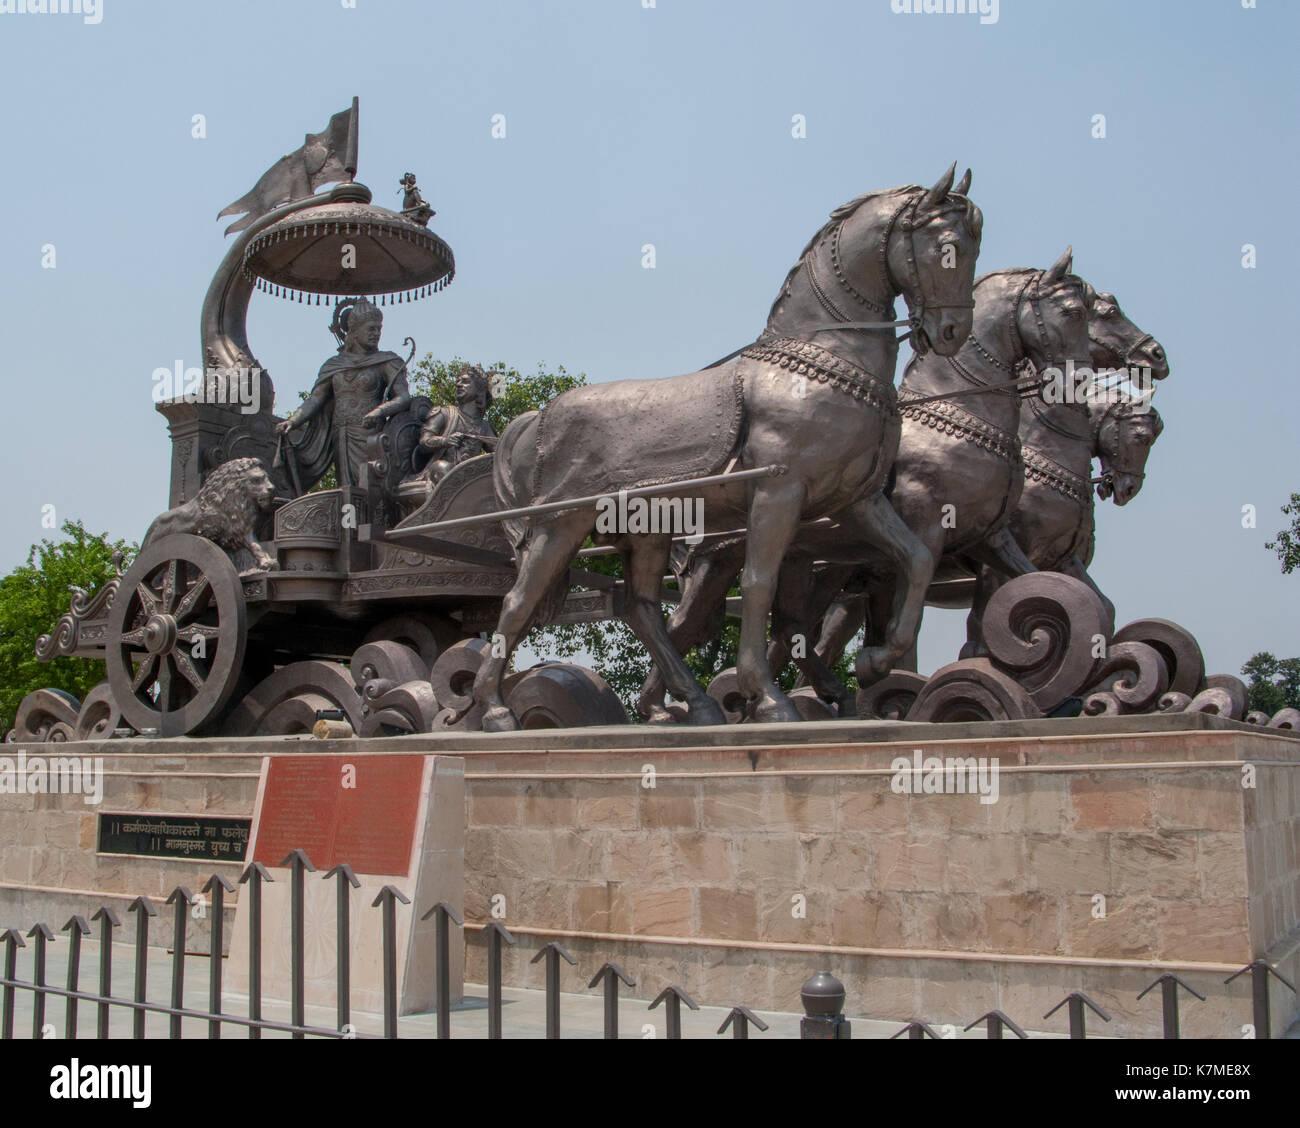 The statue of Krishna and Arjuna on the chariot, without people.  Kurukshetra, Haryana, India. - Stock Image